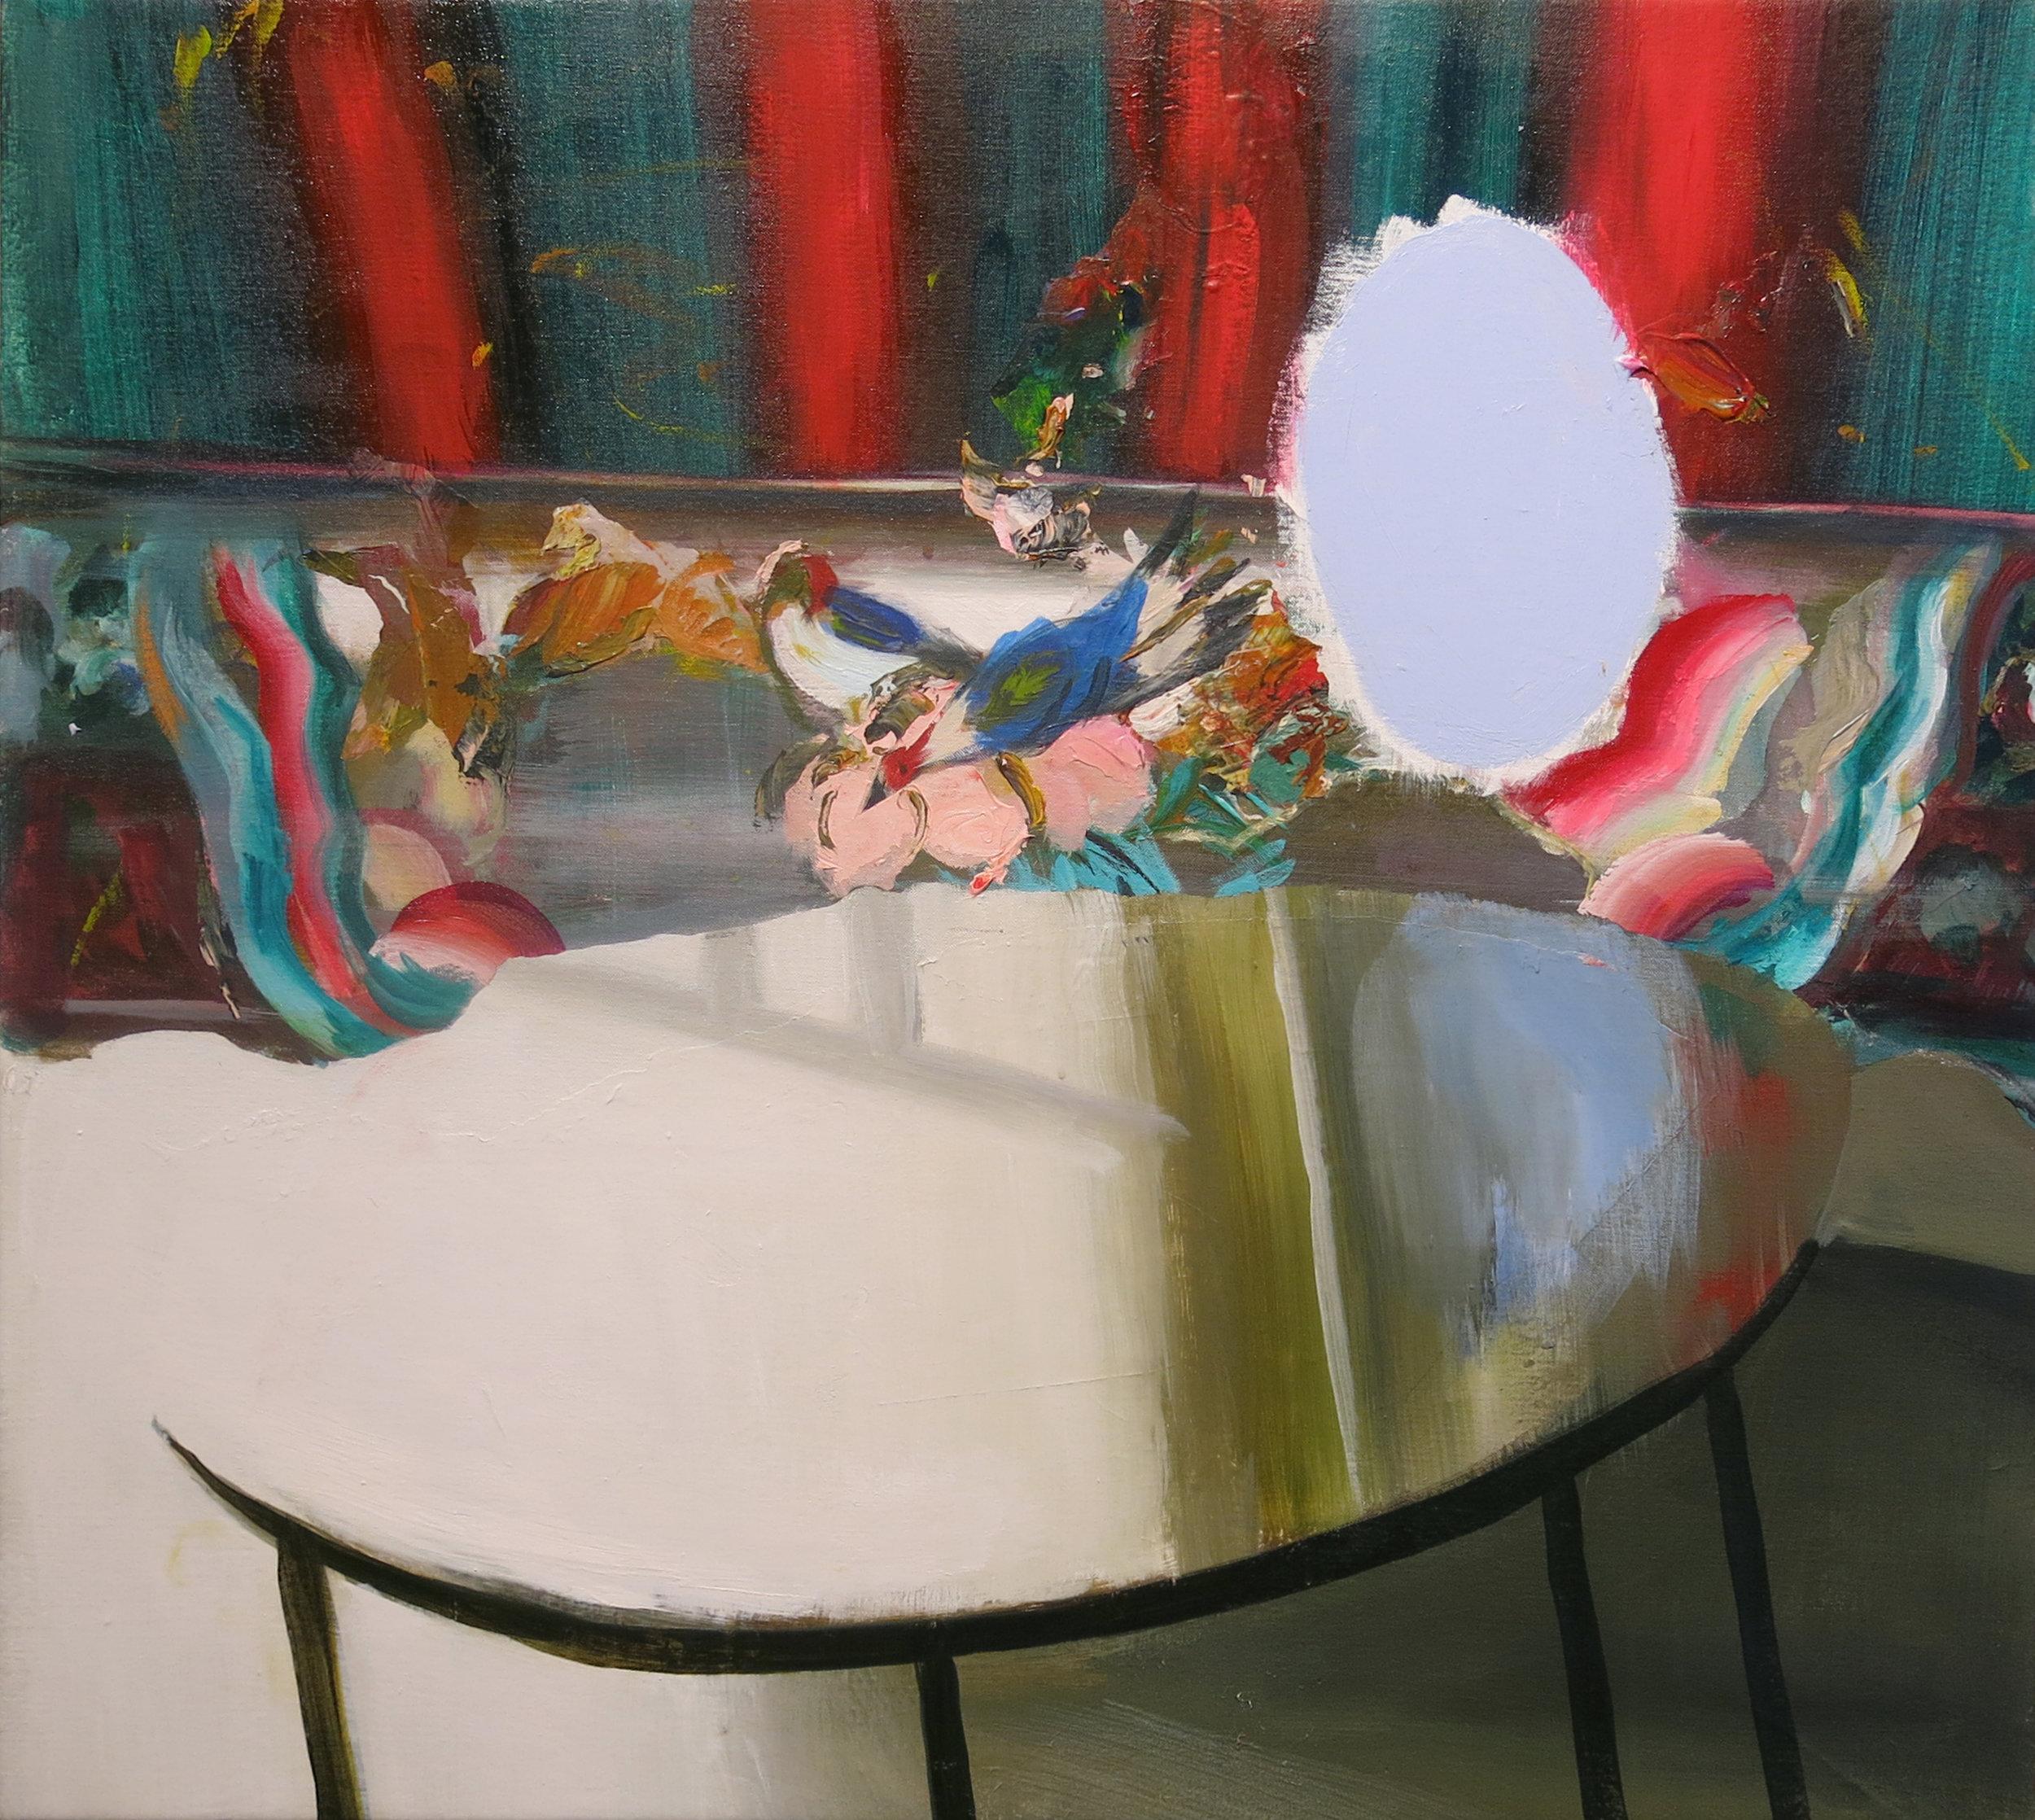 Judith Simonian, Blue Mirror Table, 2014, acrylic on canvas, 28h x 30.75w in.